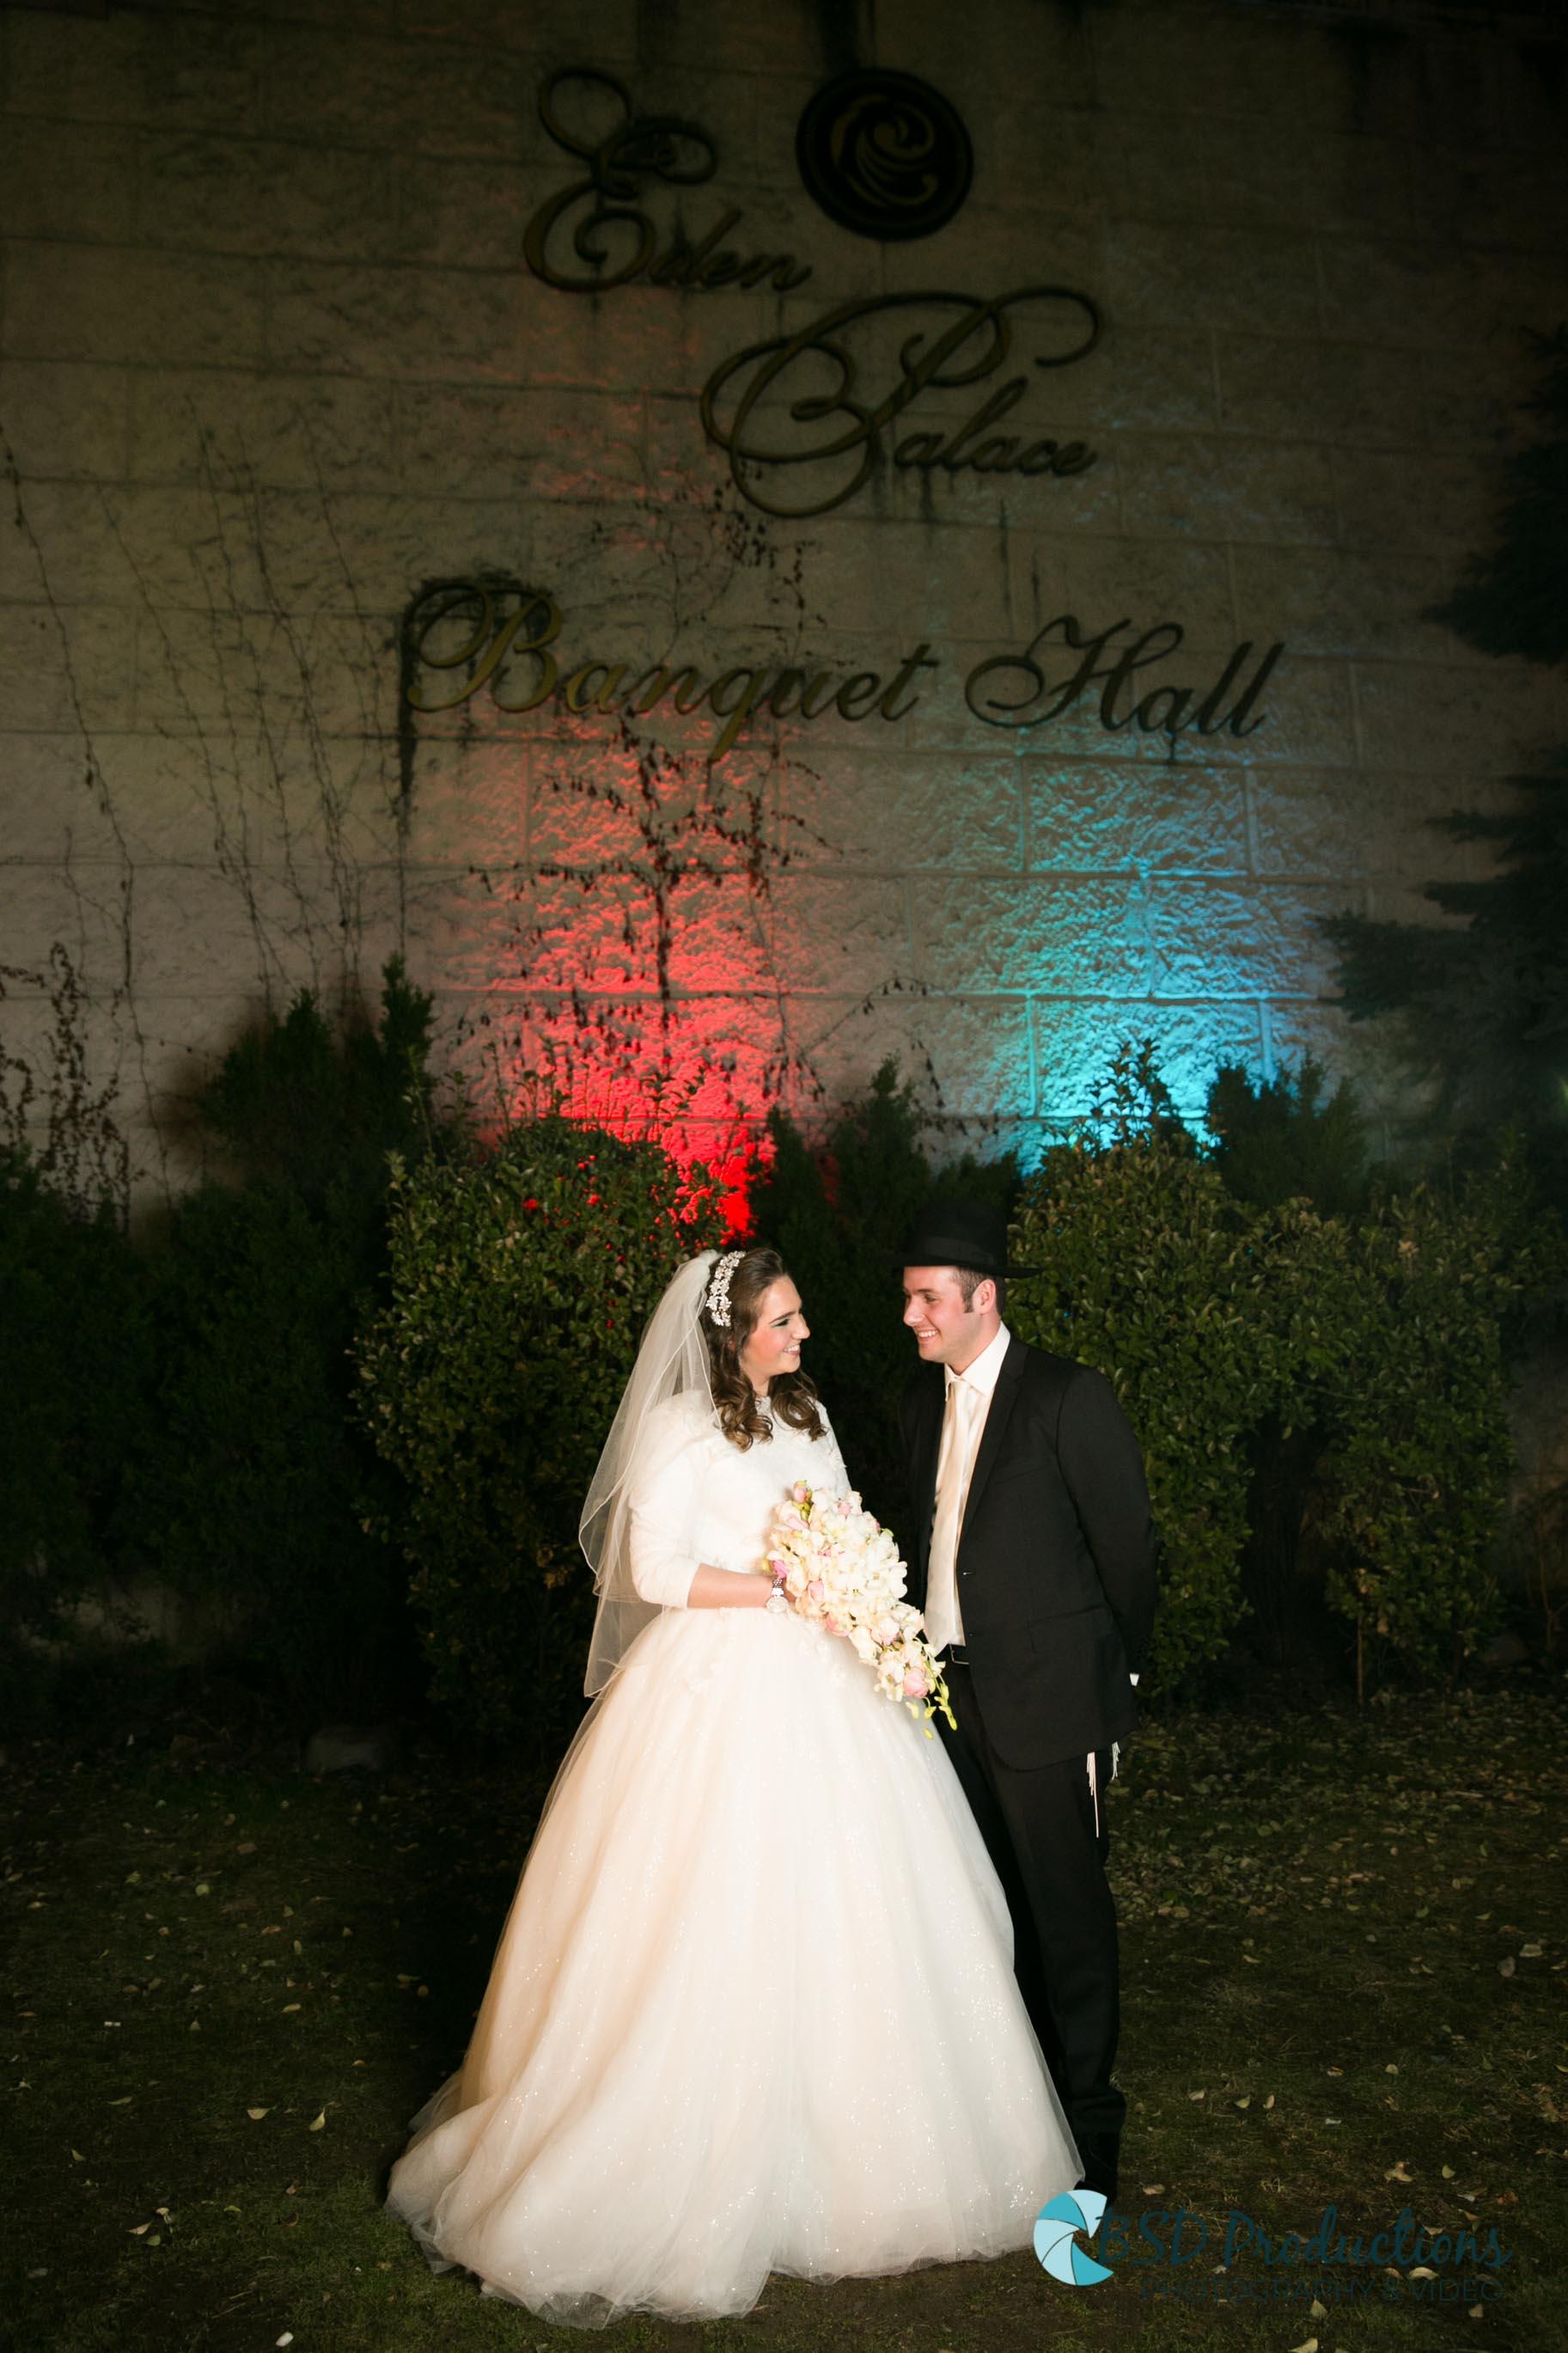 UH5A9323 Wedding – BSD Prodcutions Photography